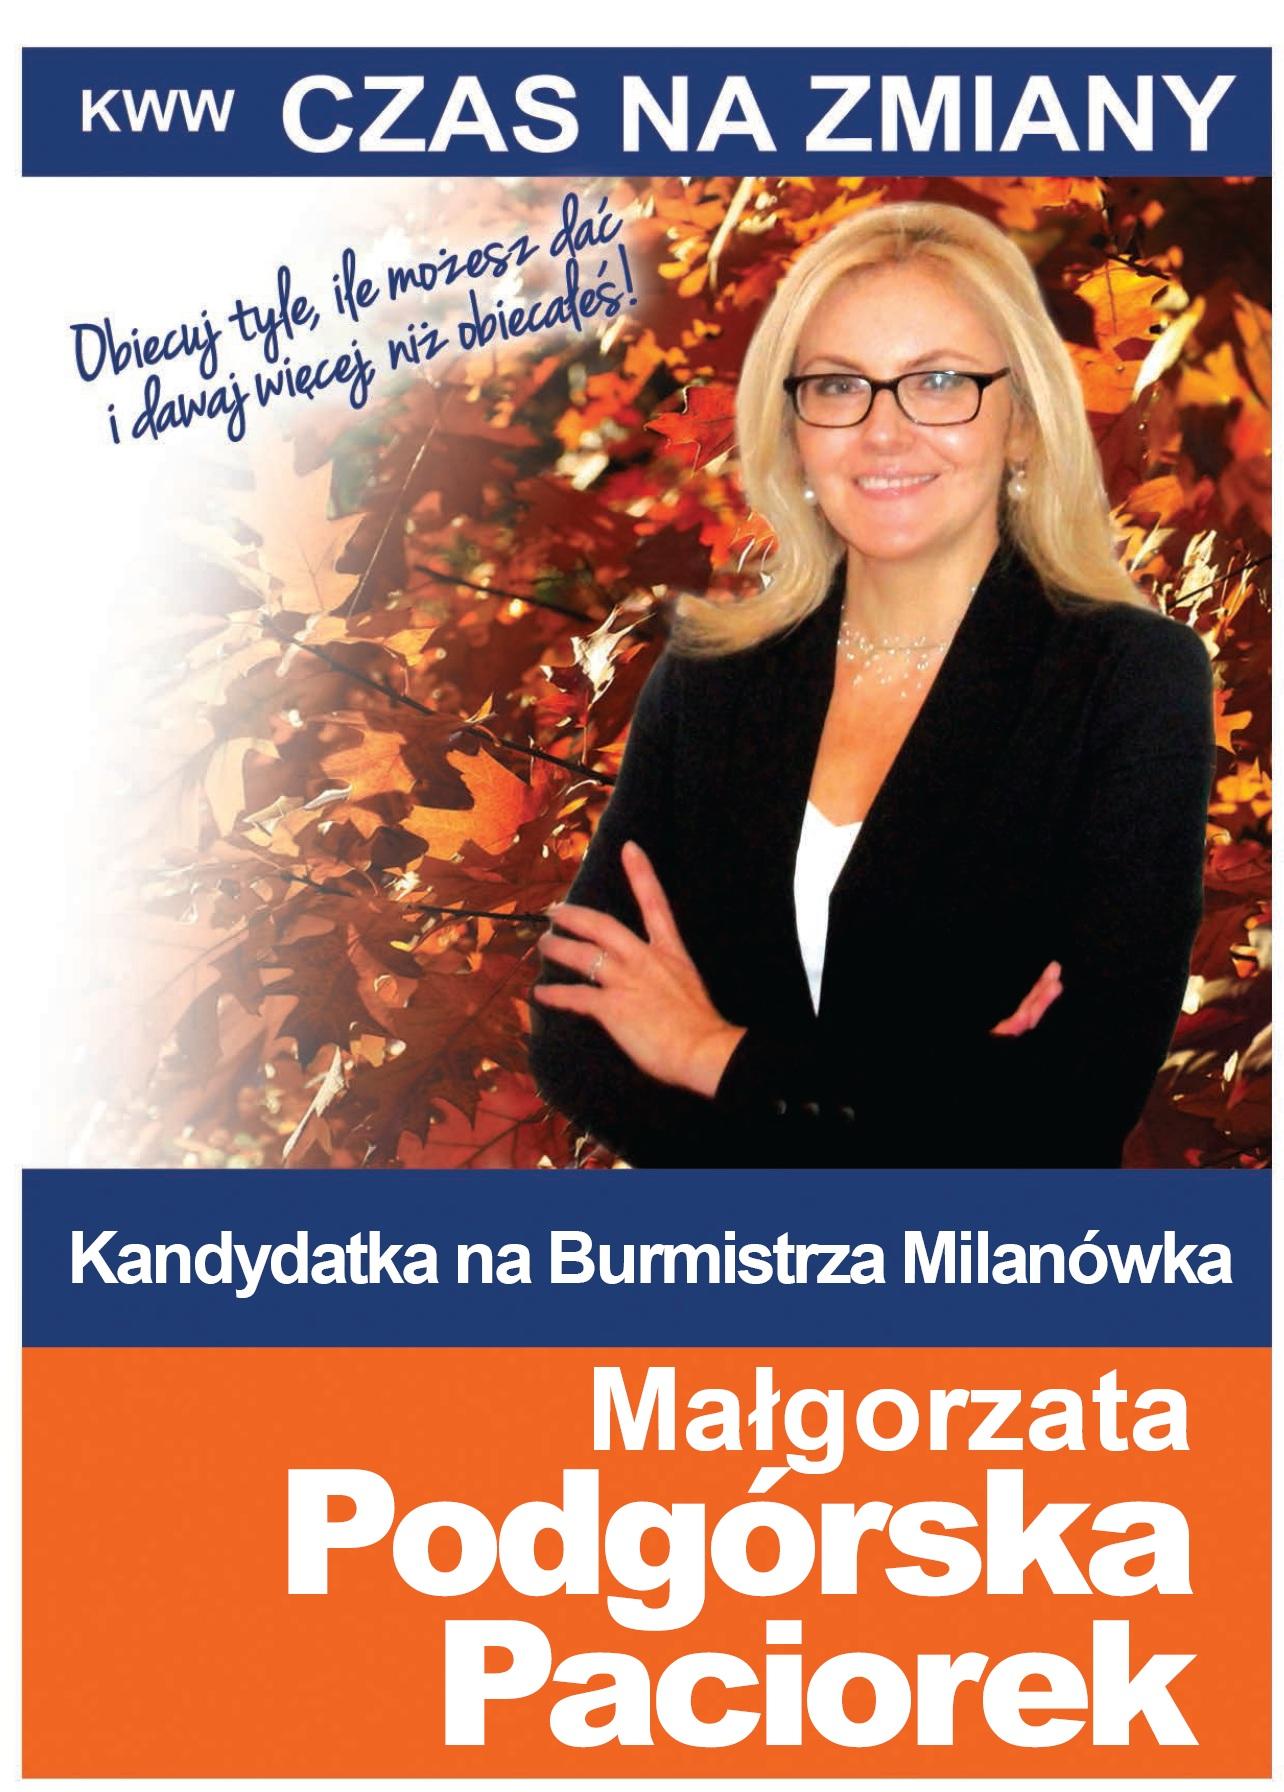 Milanowek_M.Paciorek 9wybory2014